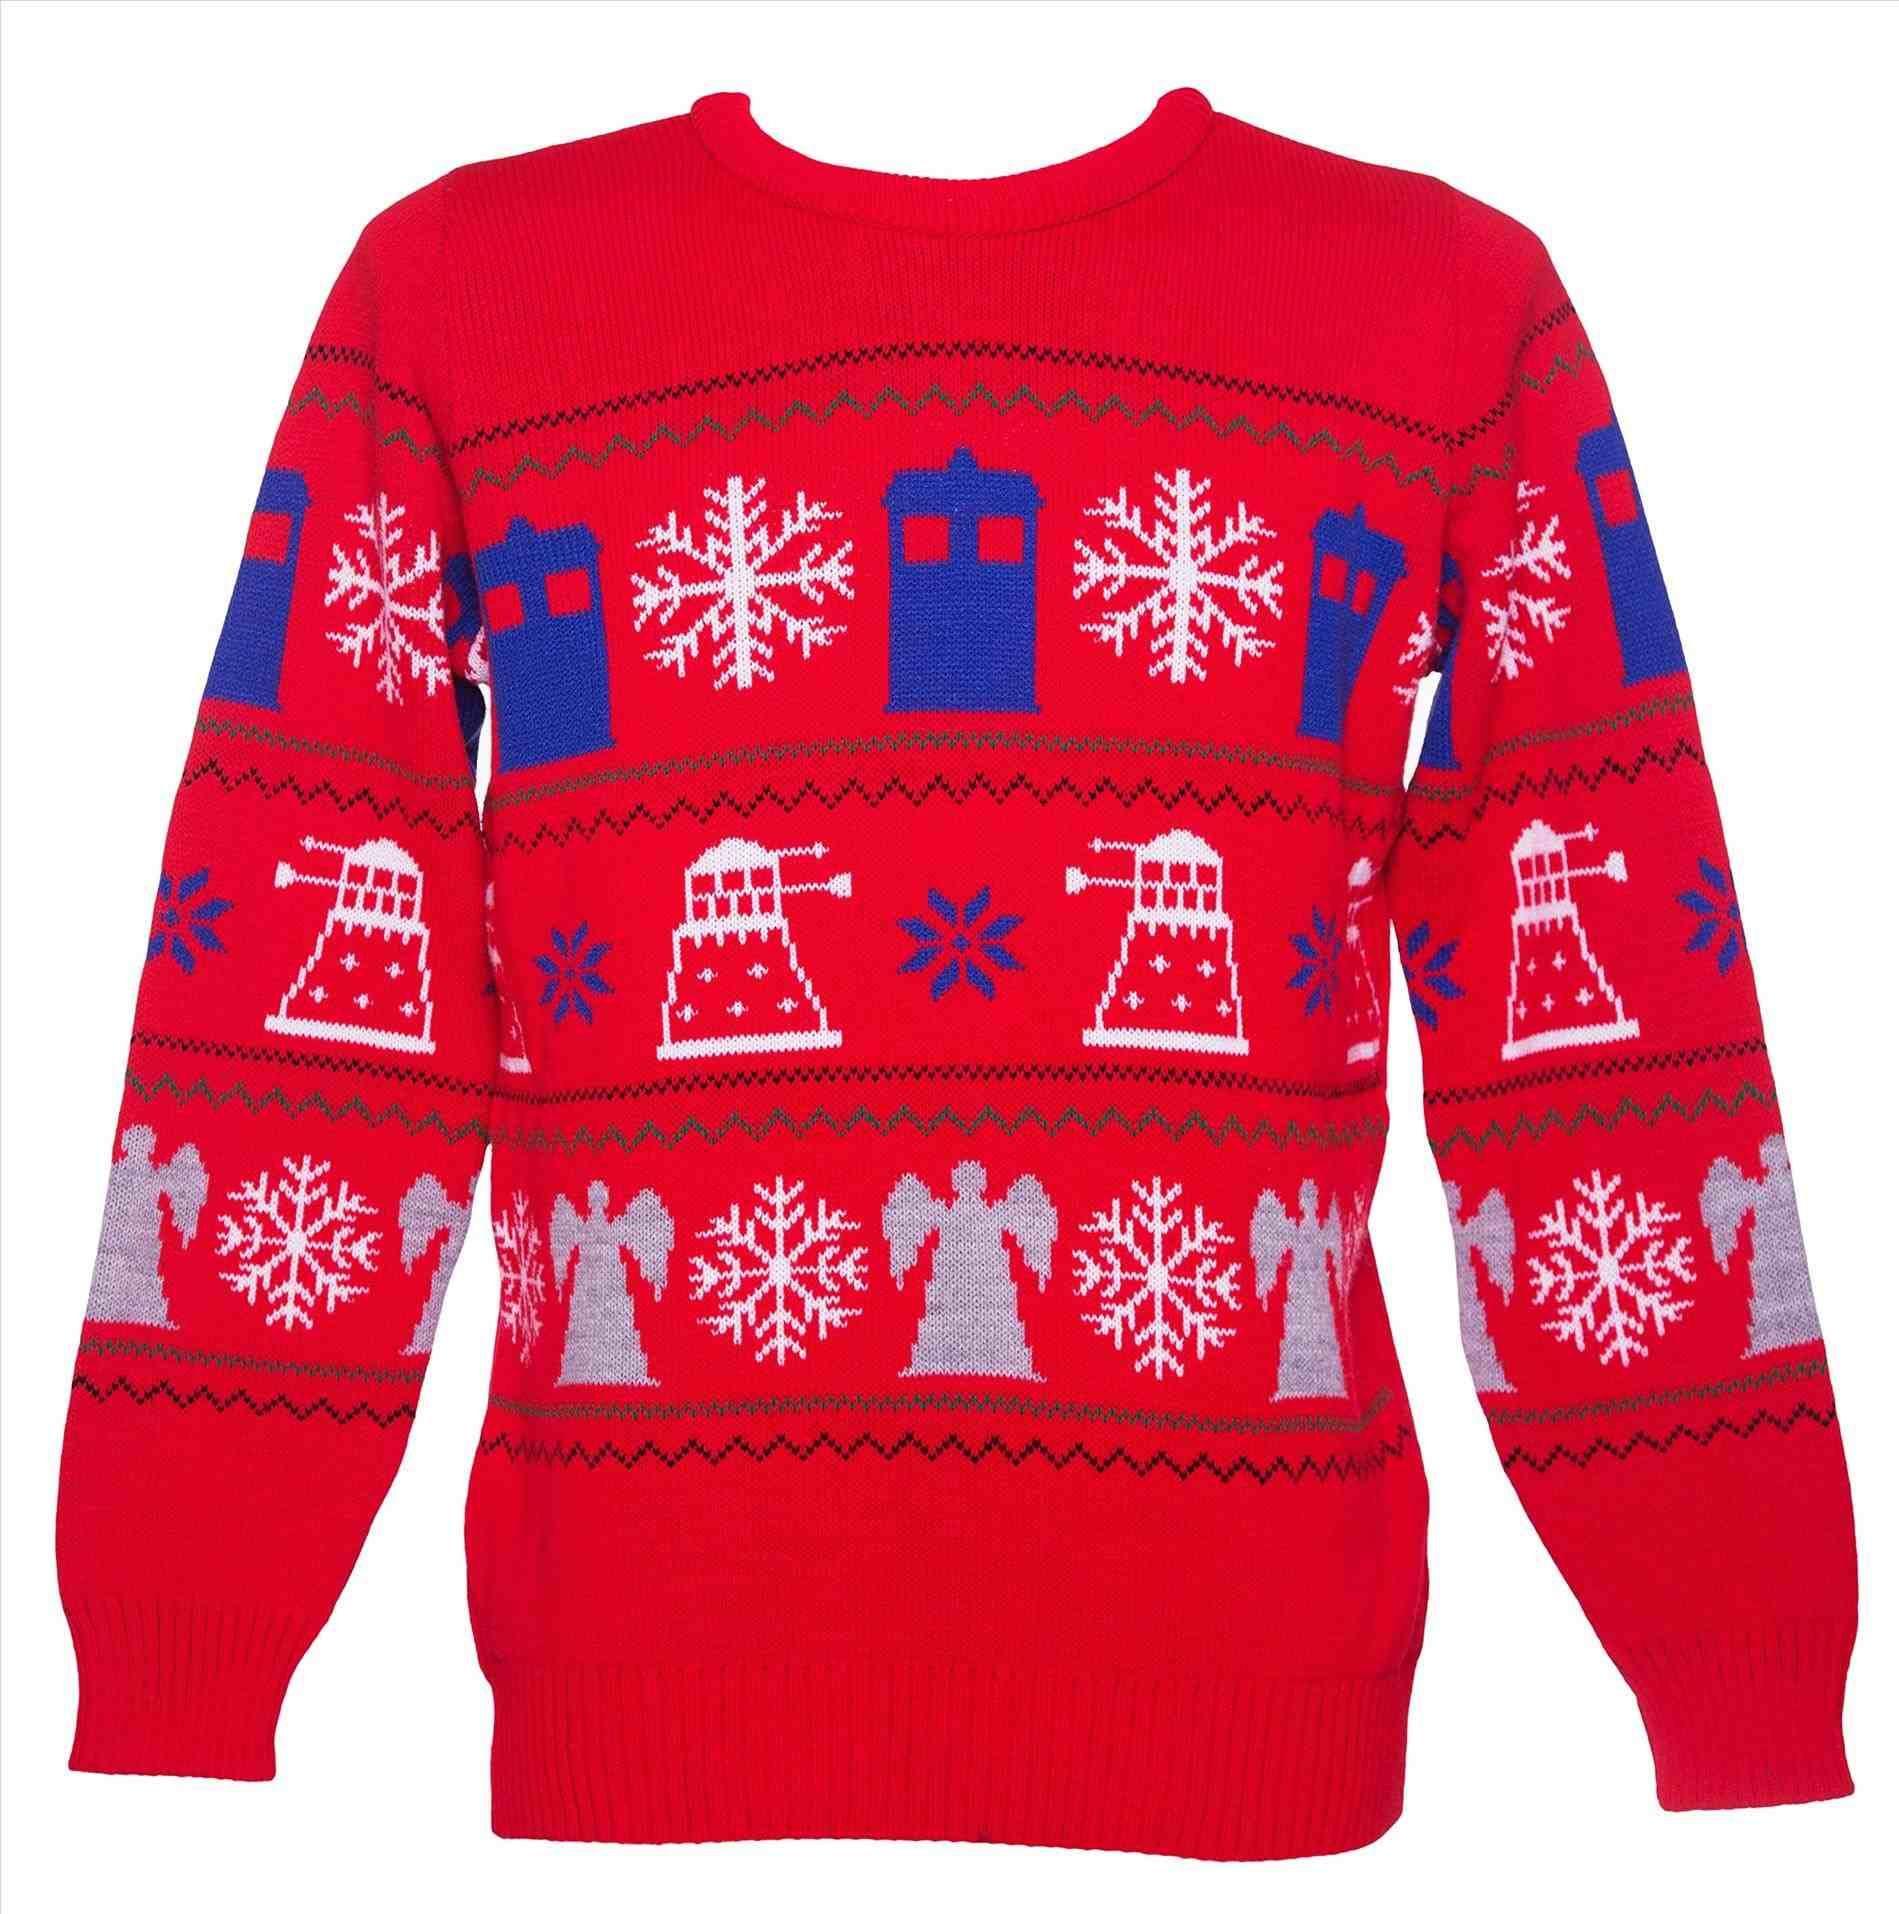 funny sayings on christmas sweaters